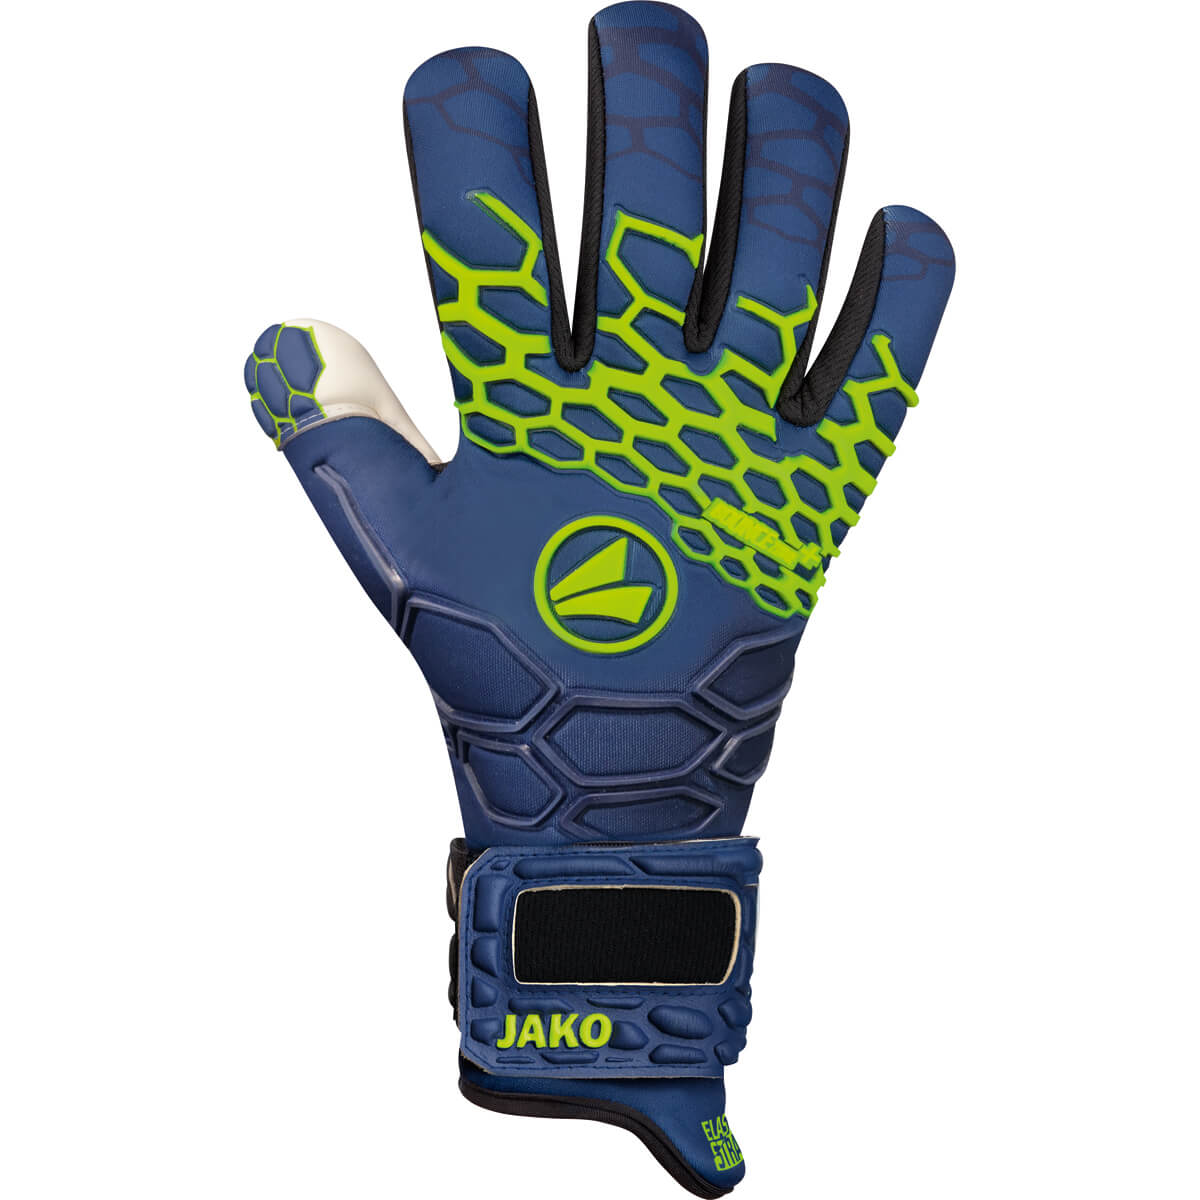 TW-Handschuh Prestige GIGA Negative Cut -  | Jako 2551